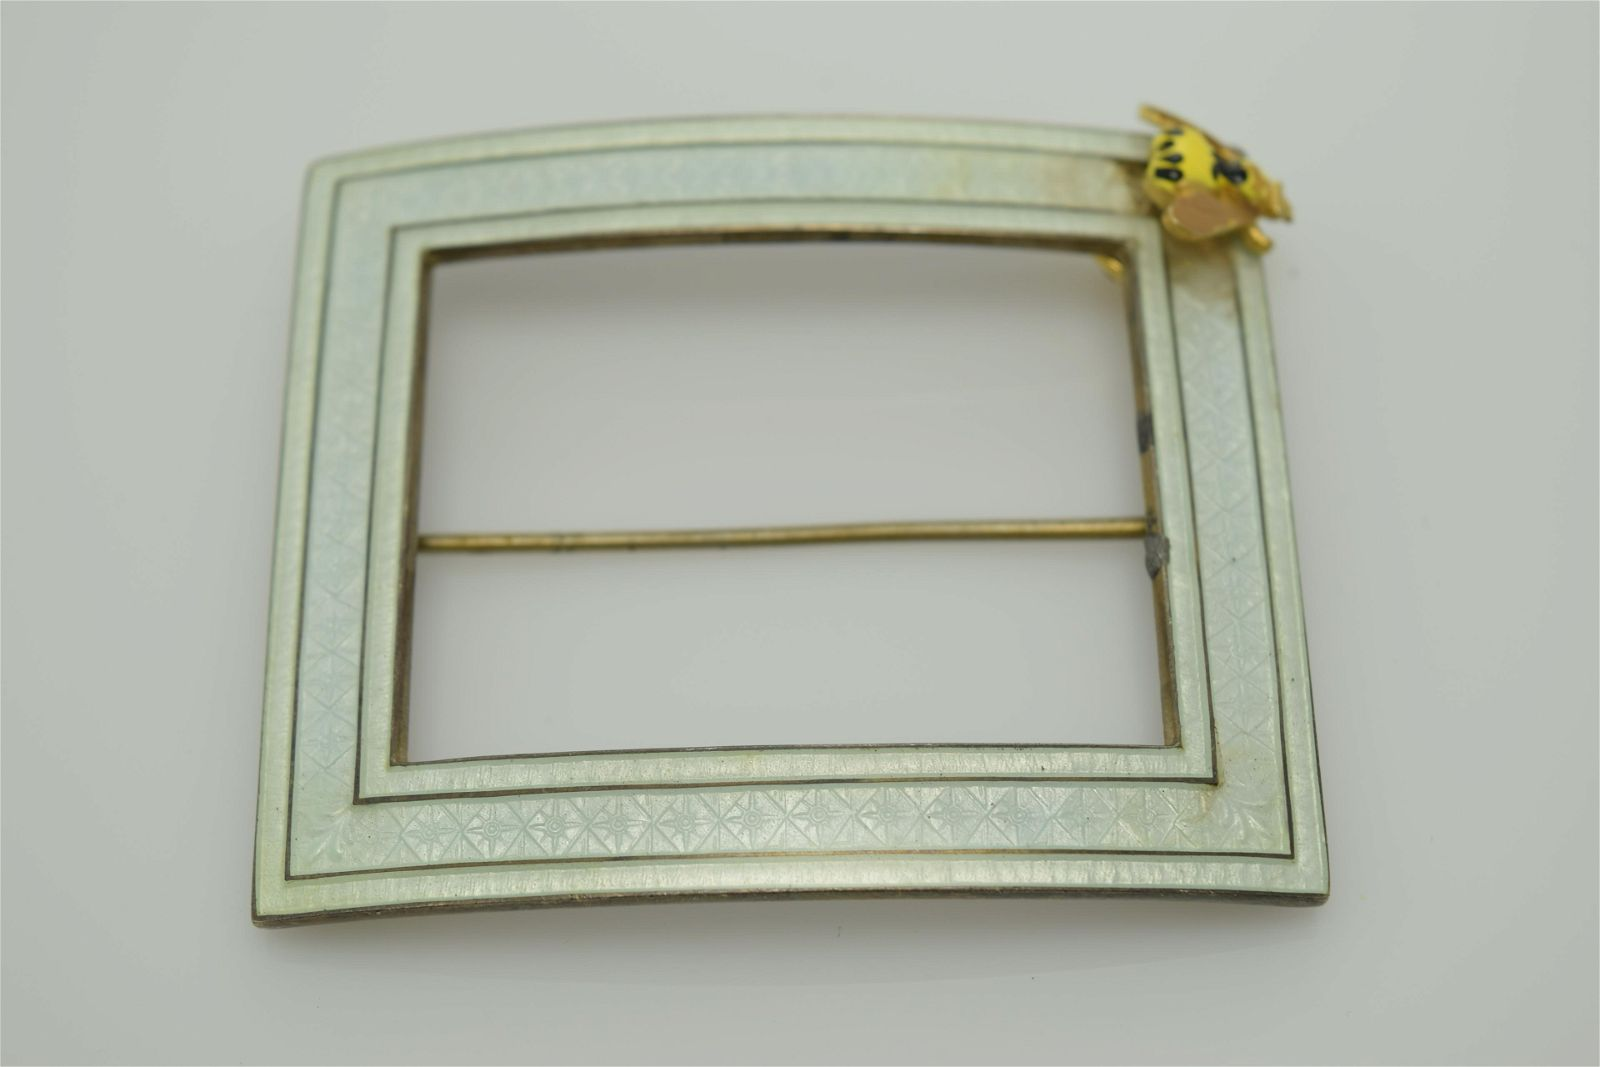 A vintage guilloche enamel square, sterling silver